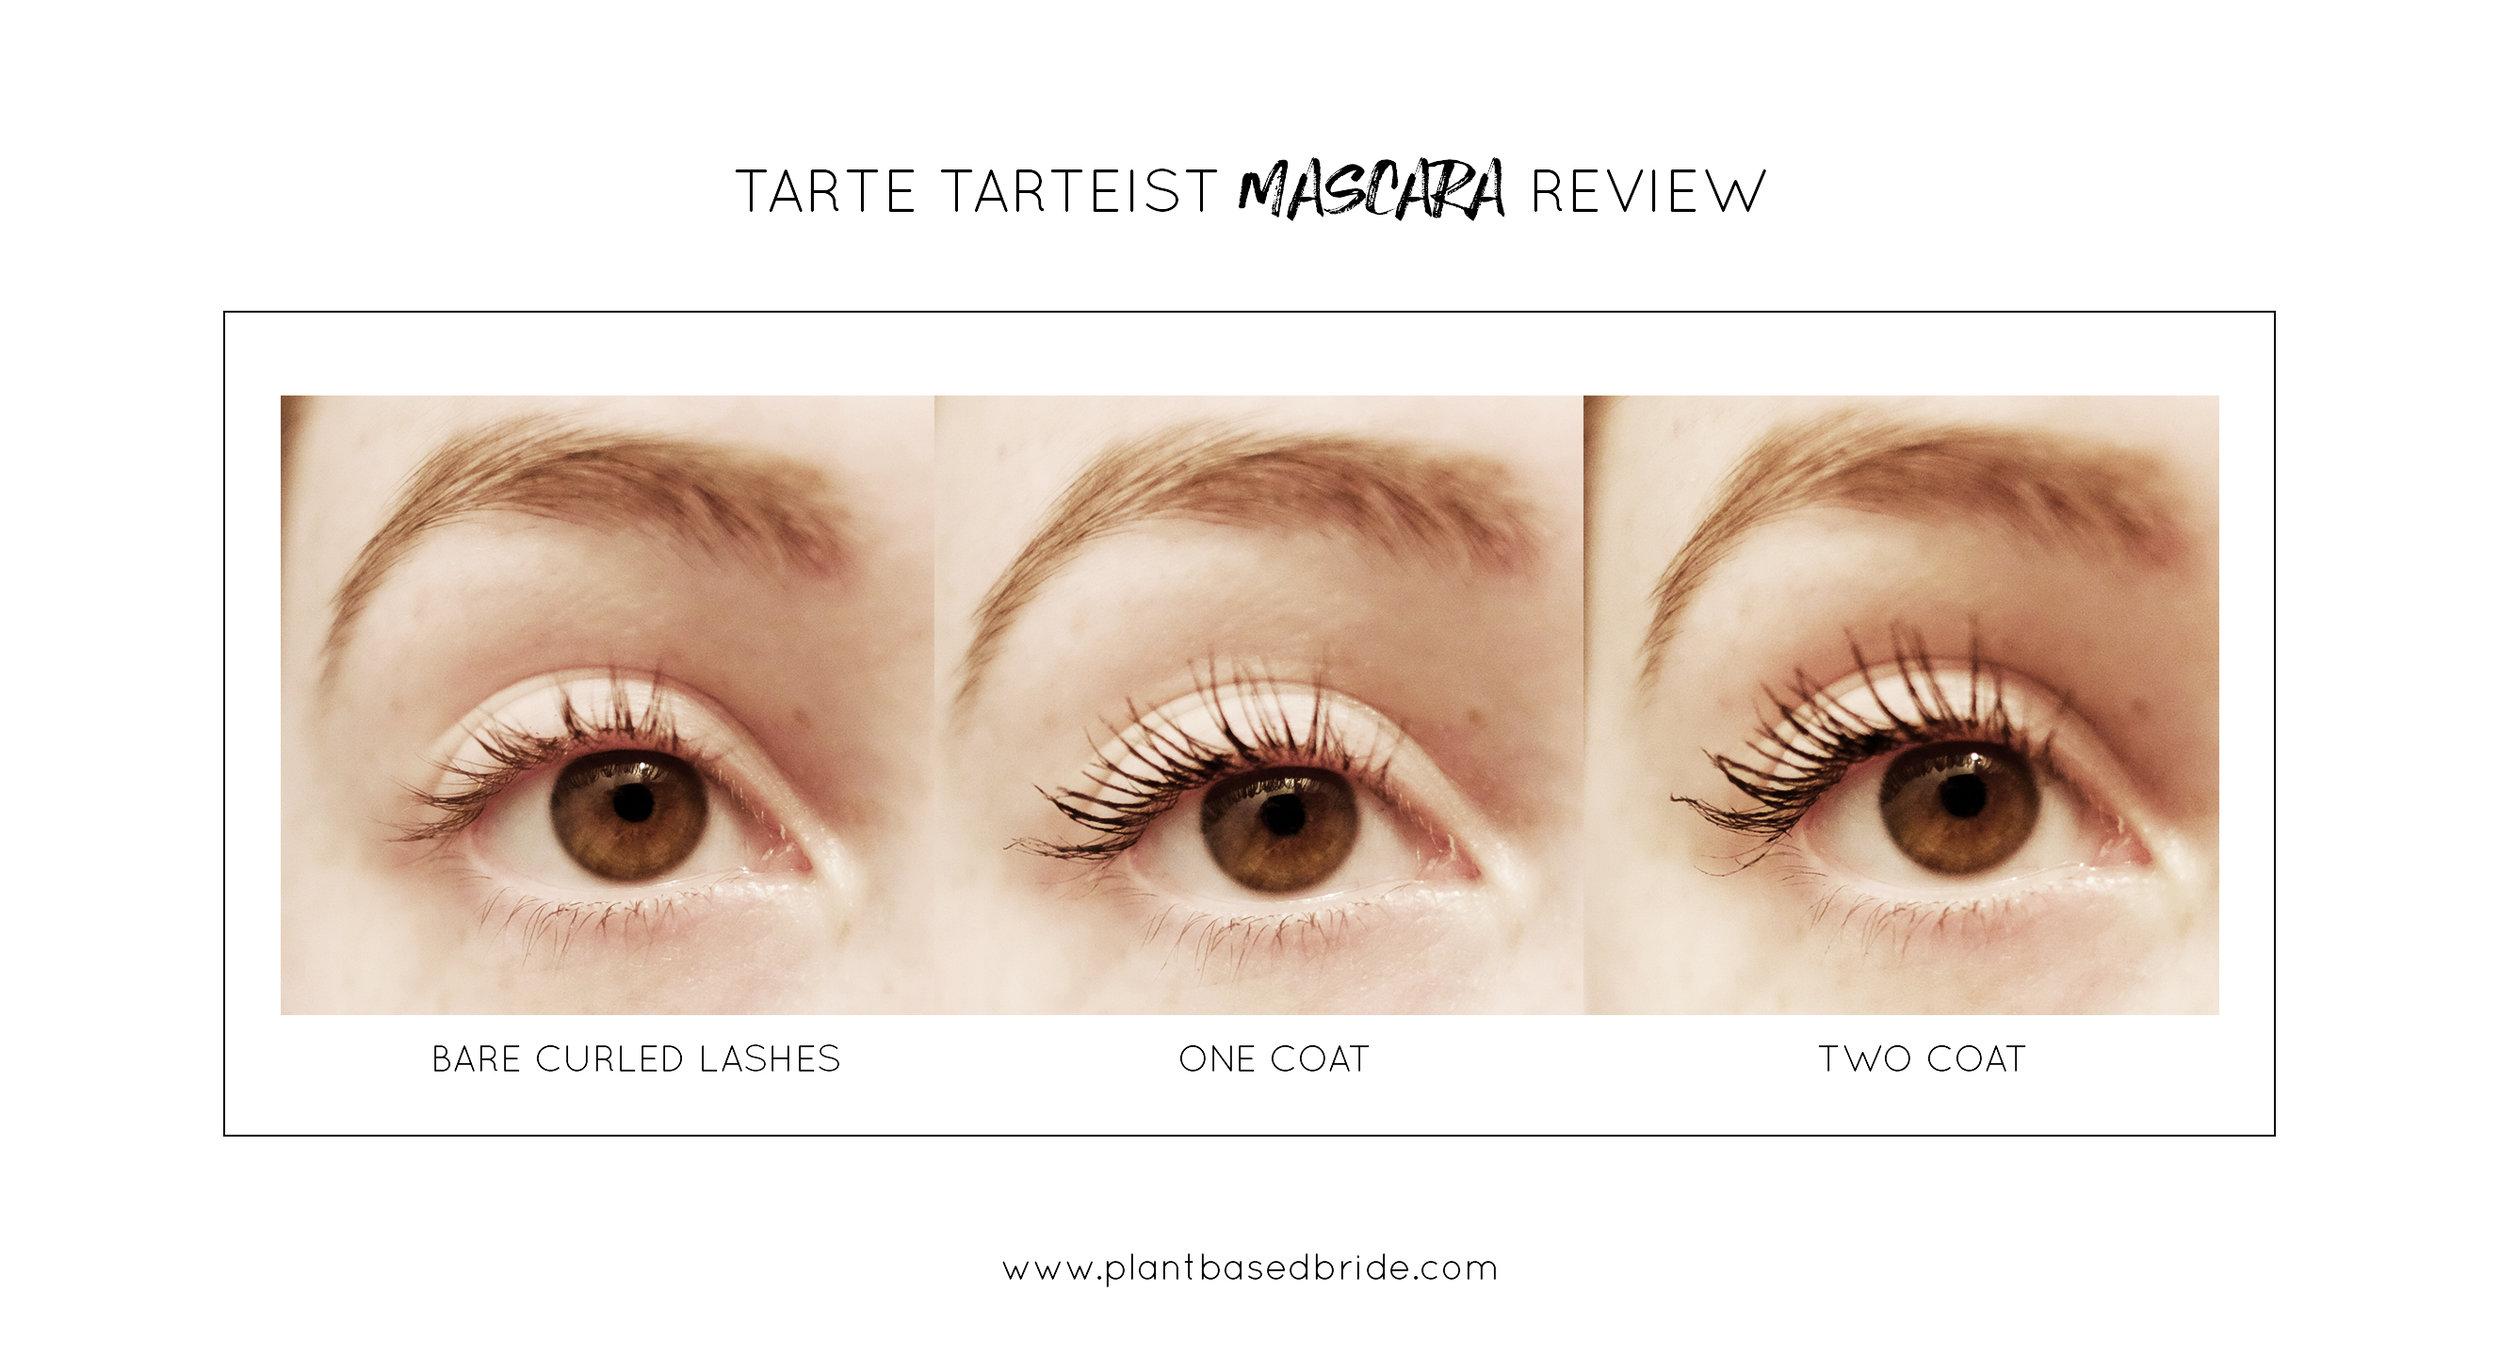 Tarte Tarteist Vegan Mascara Review // Plant Based Bride